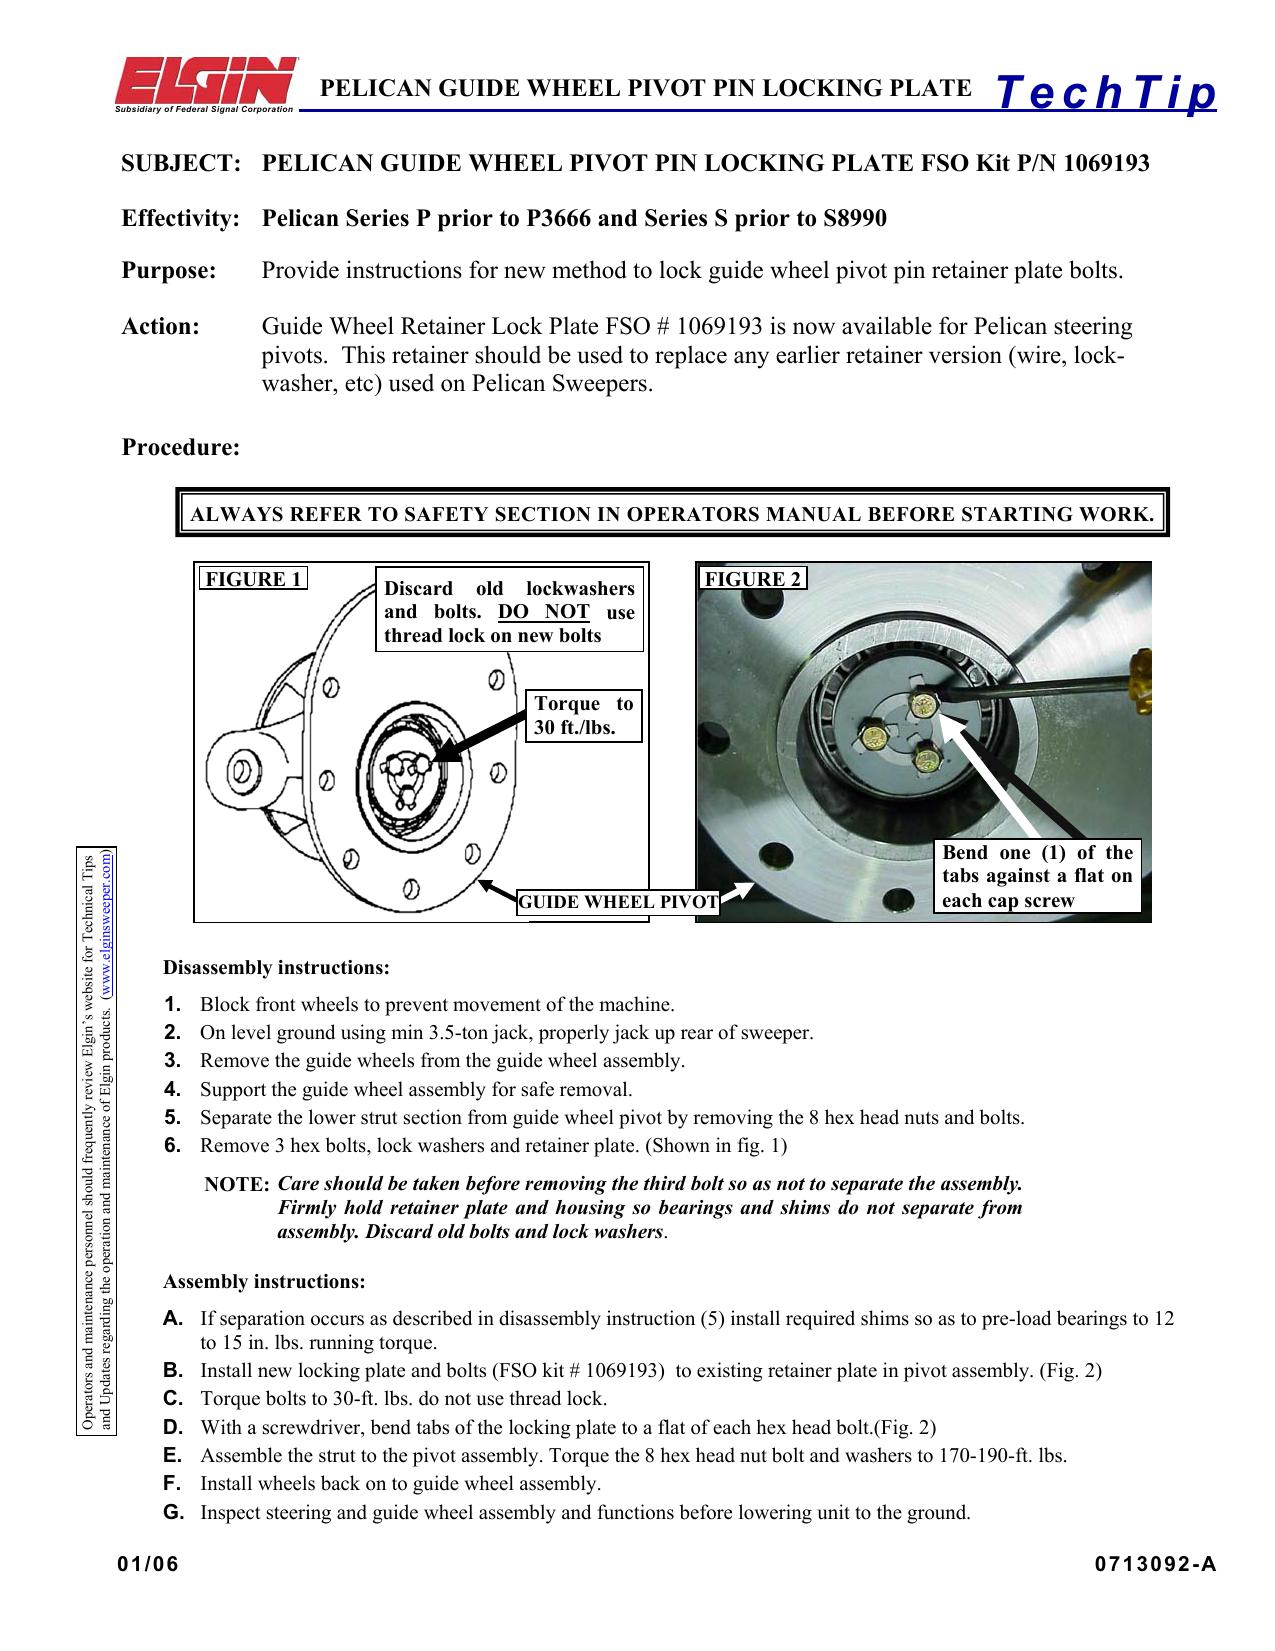 Help Needed Nissan K11 Ncvt Wiring Diagram Cisco39s Micra Files